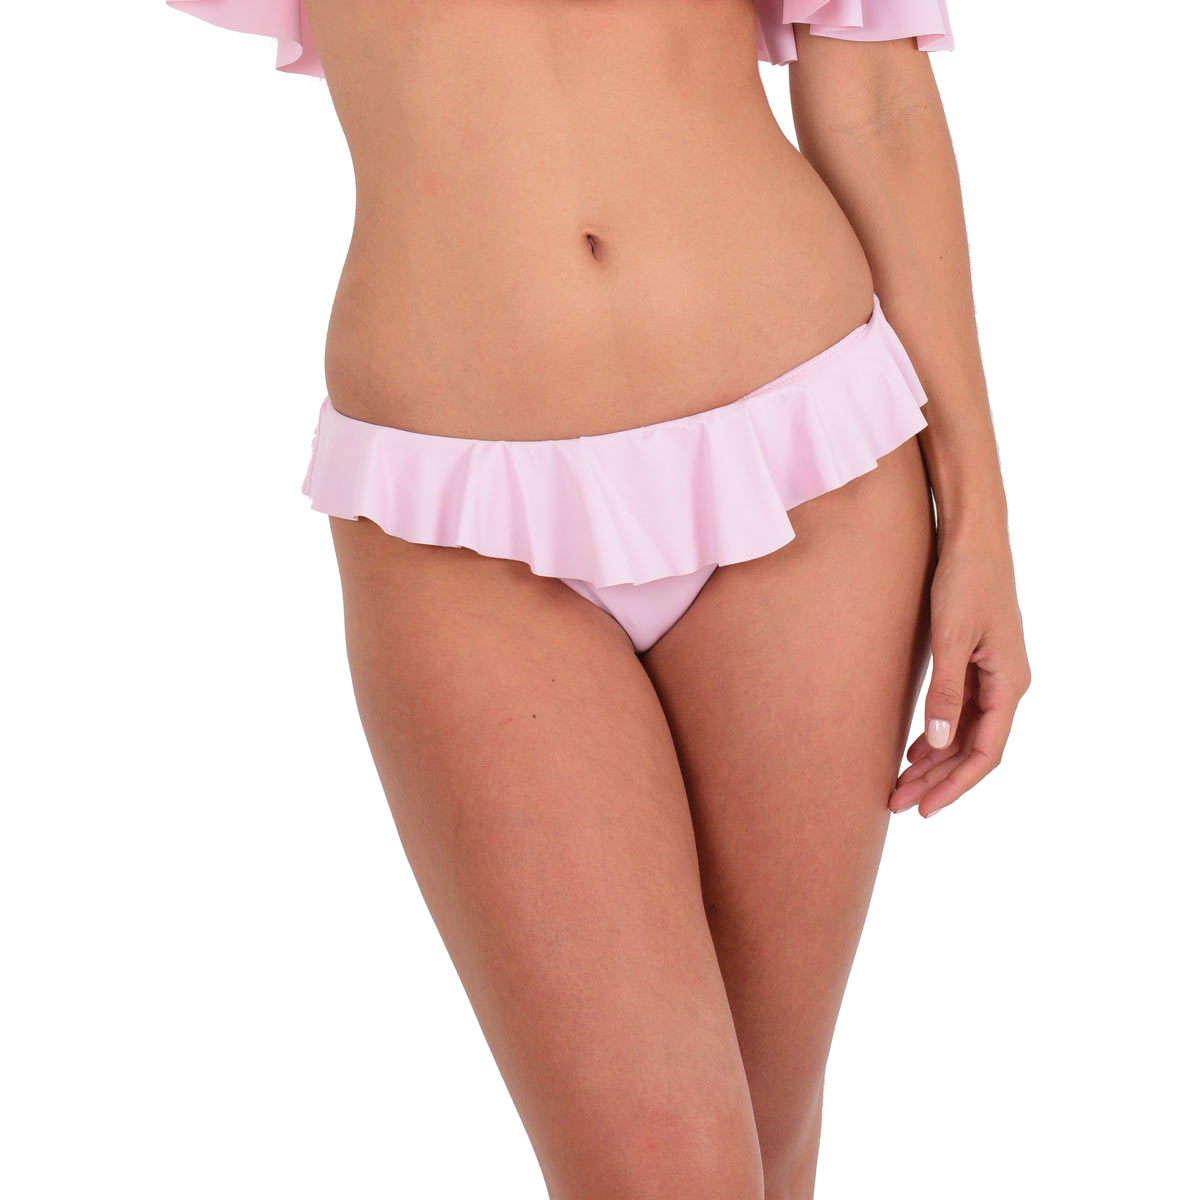 Ma Culotte à Volant rose pastel (Bas)